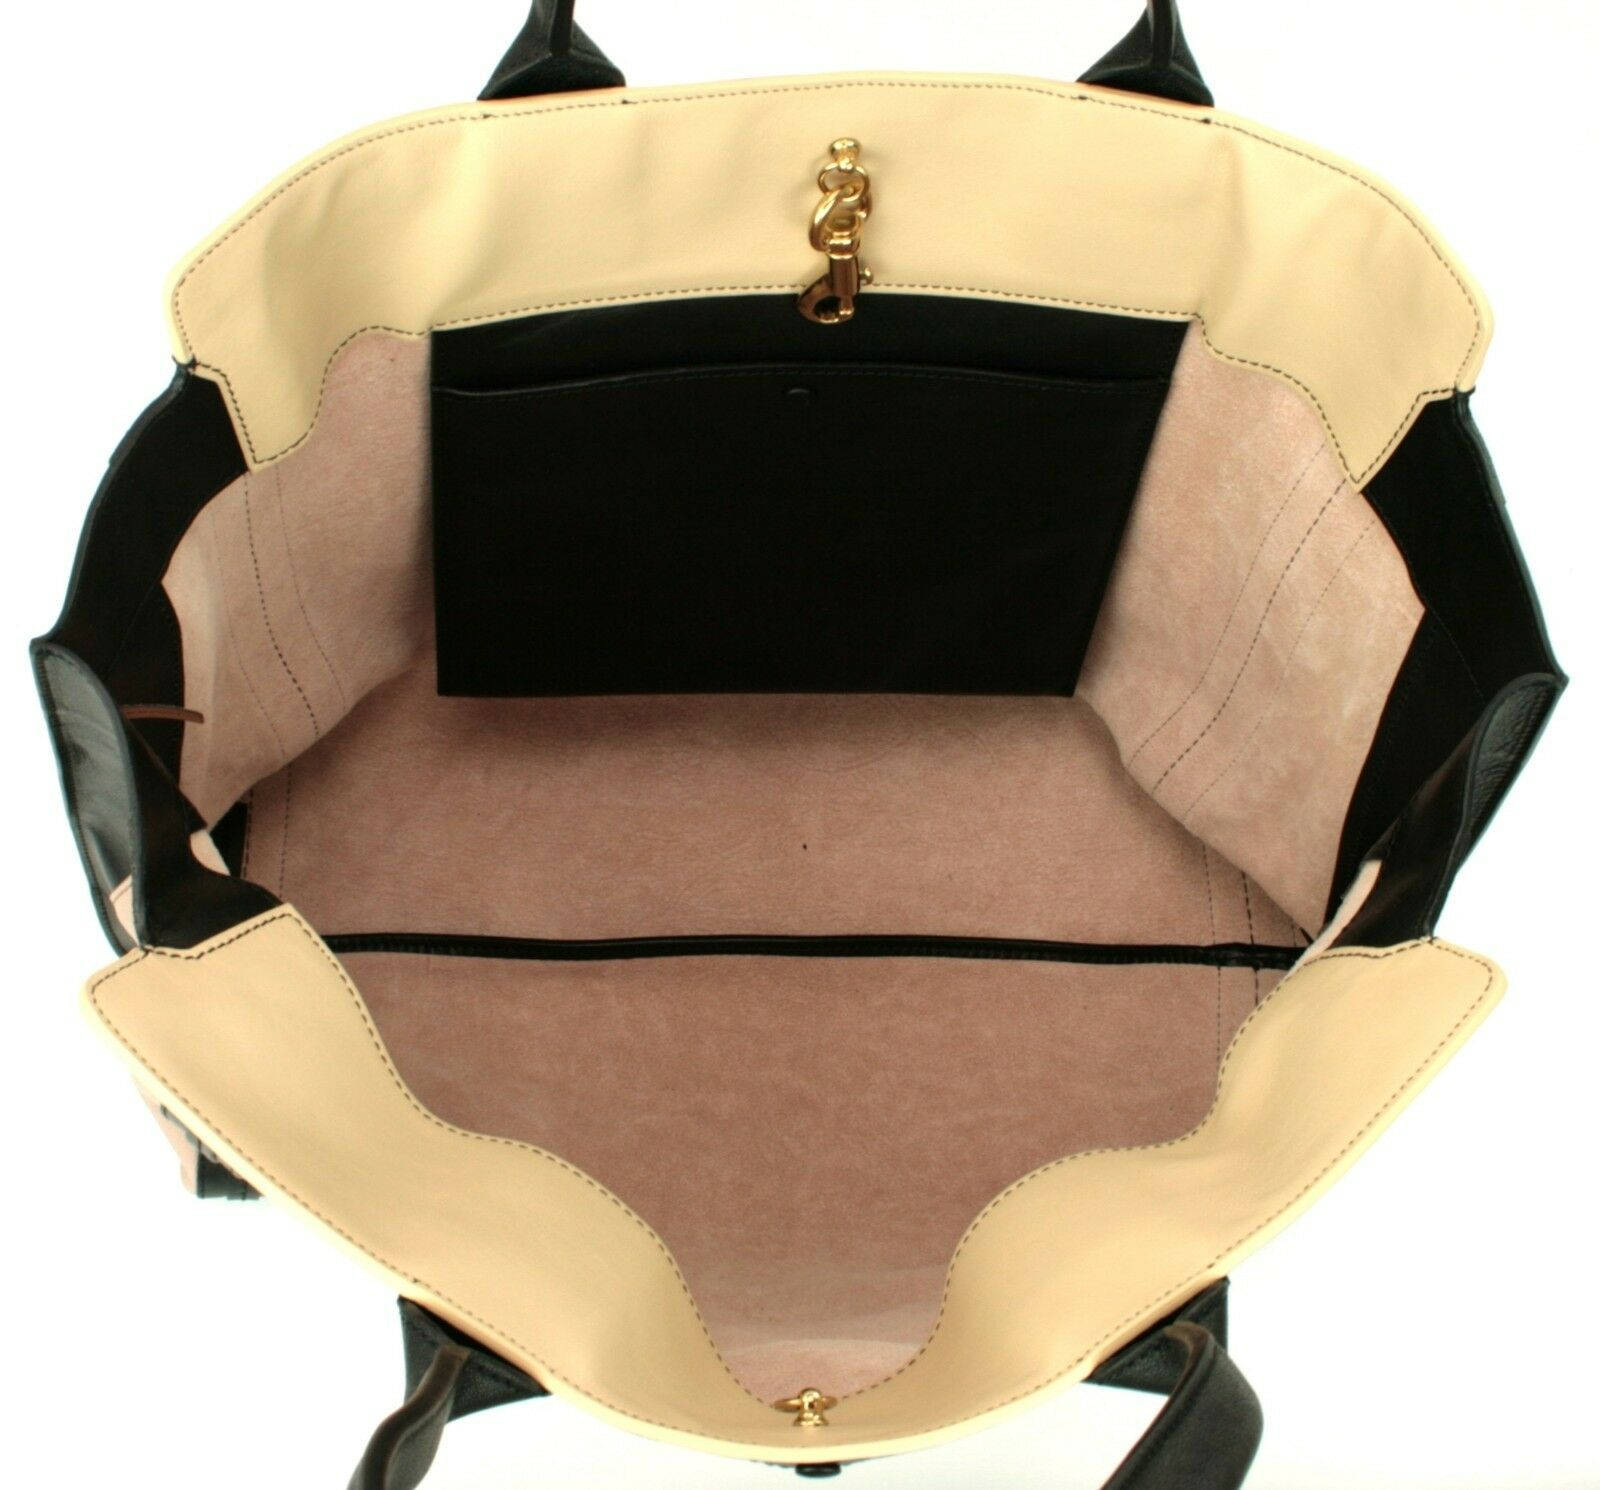 Chloe Alison Tote Bag Leather Tea Petal and Black Medium Handbag RRP £880  image 5